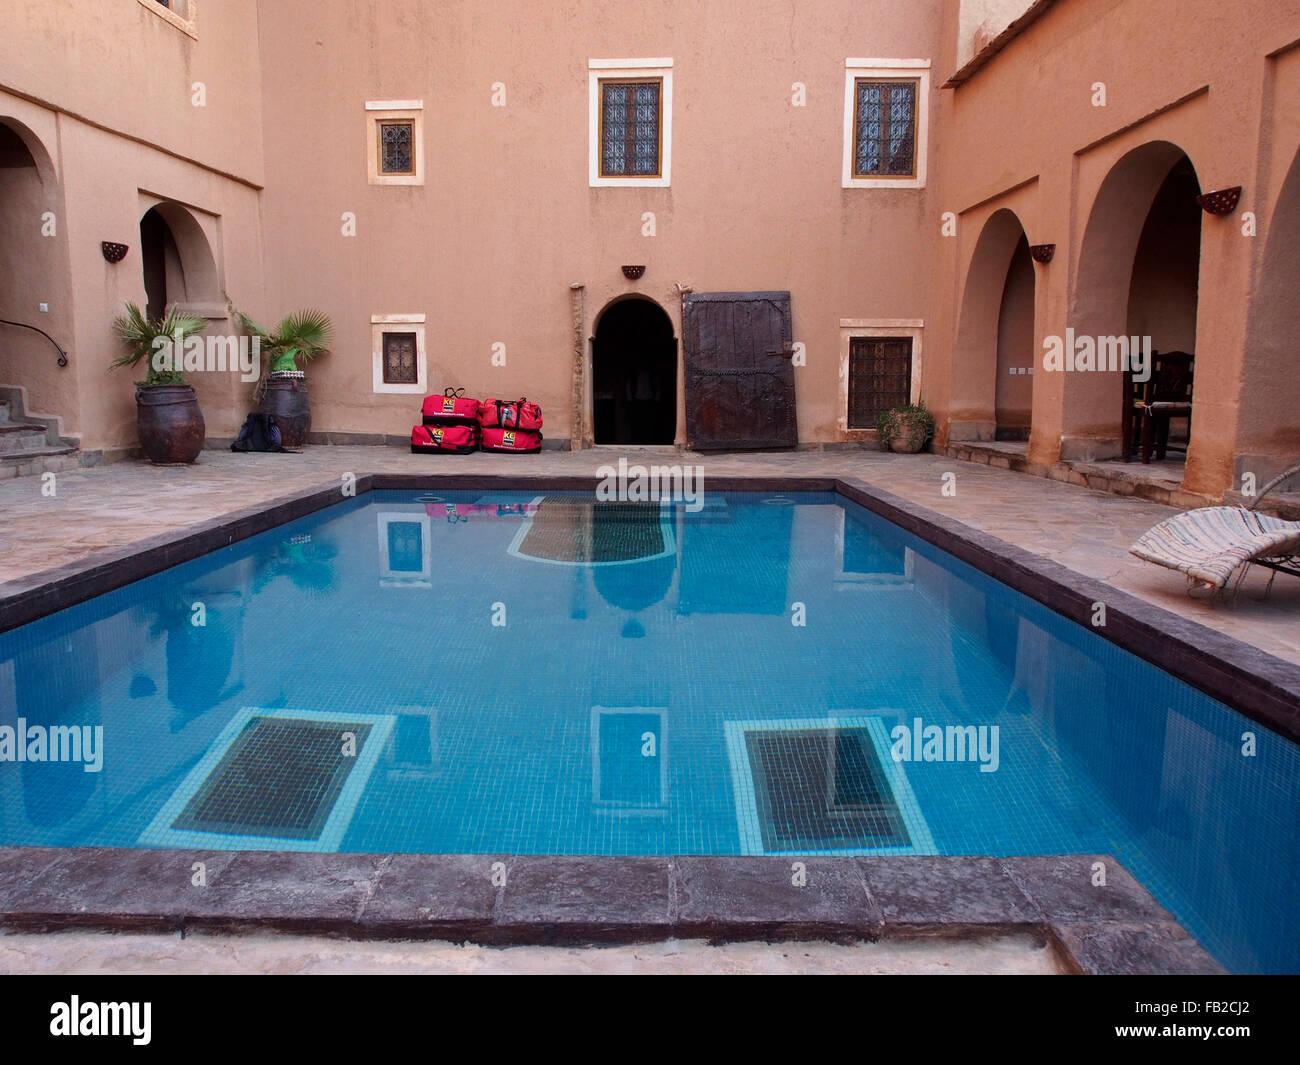 Pool Kit Stock Photos & Pool Kit Stock Images - Alamy